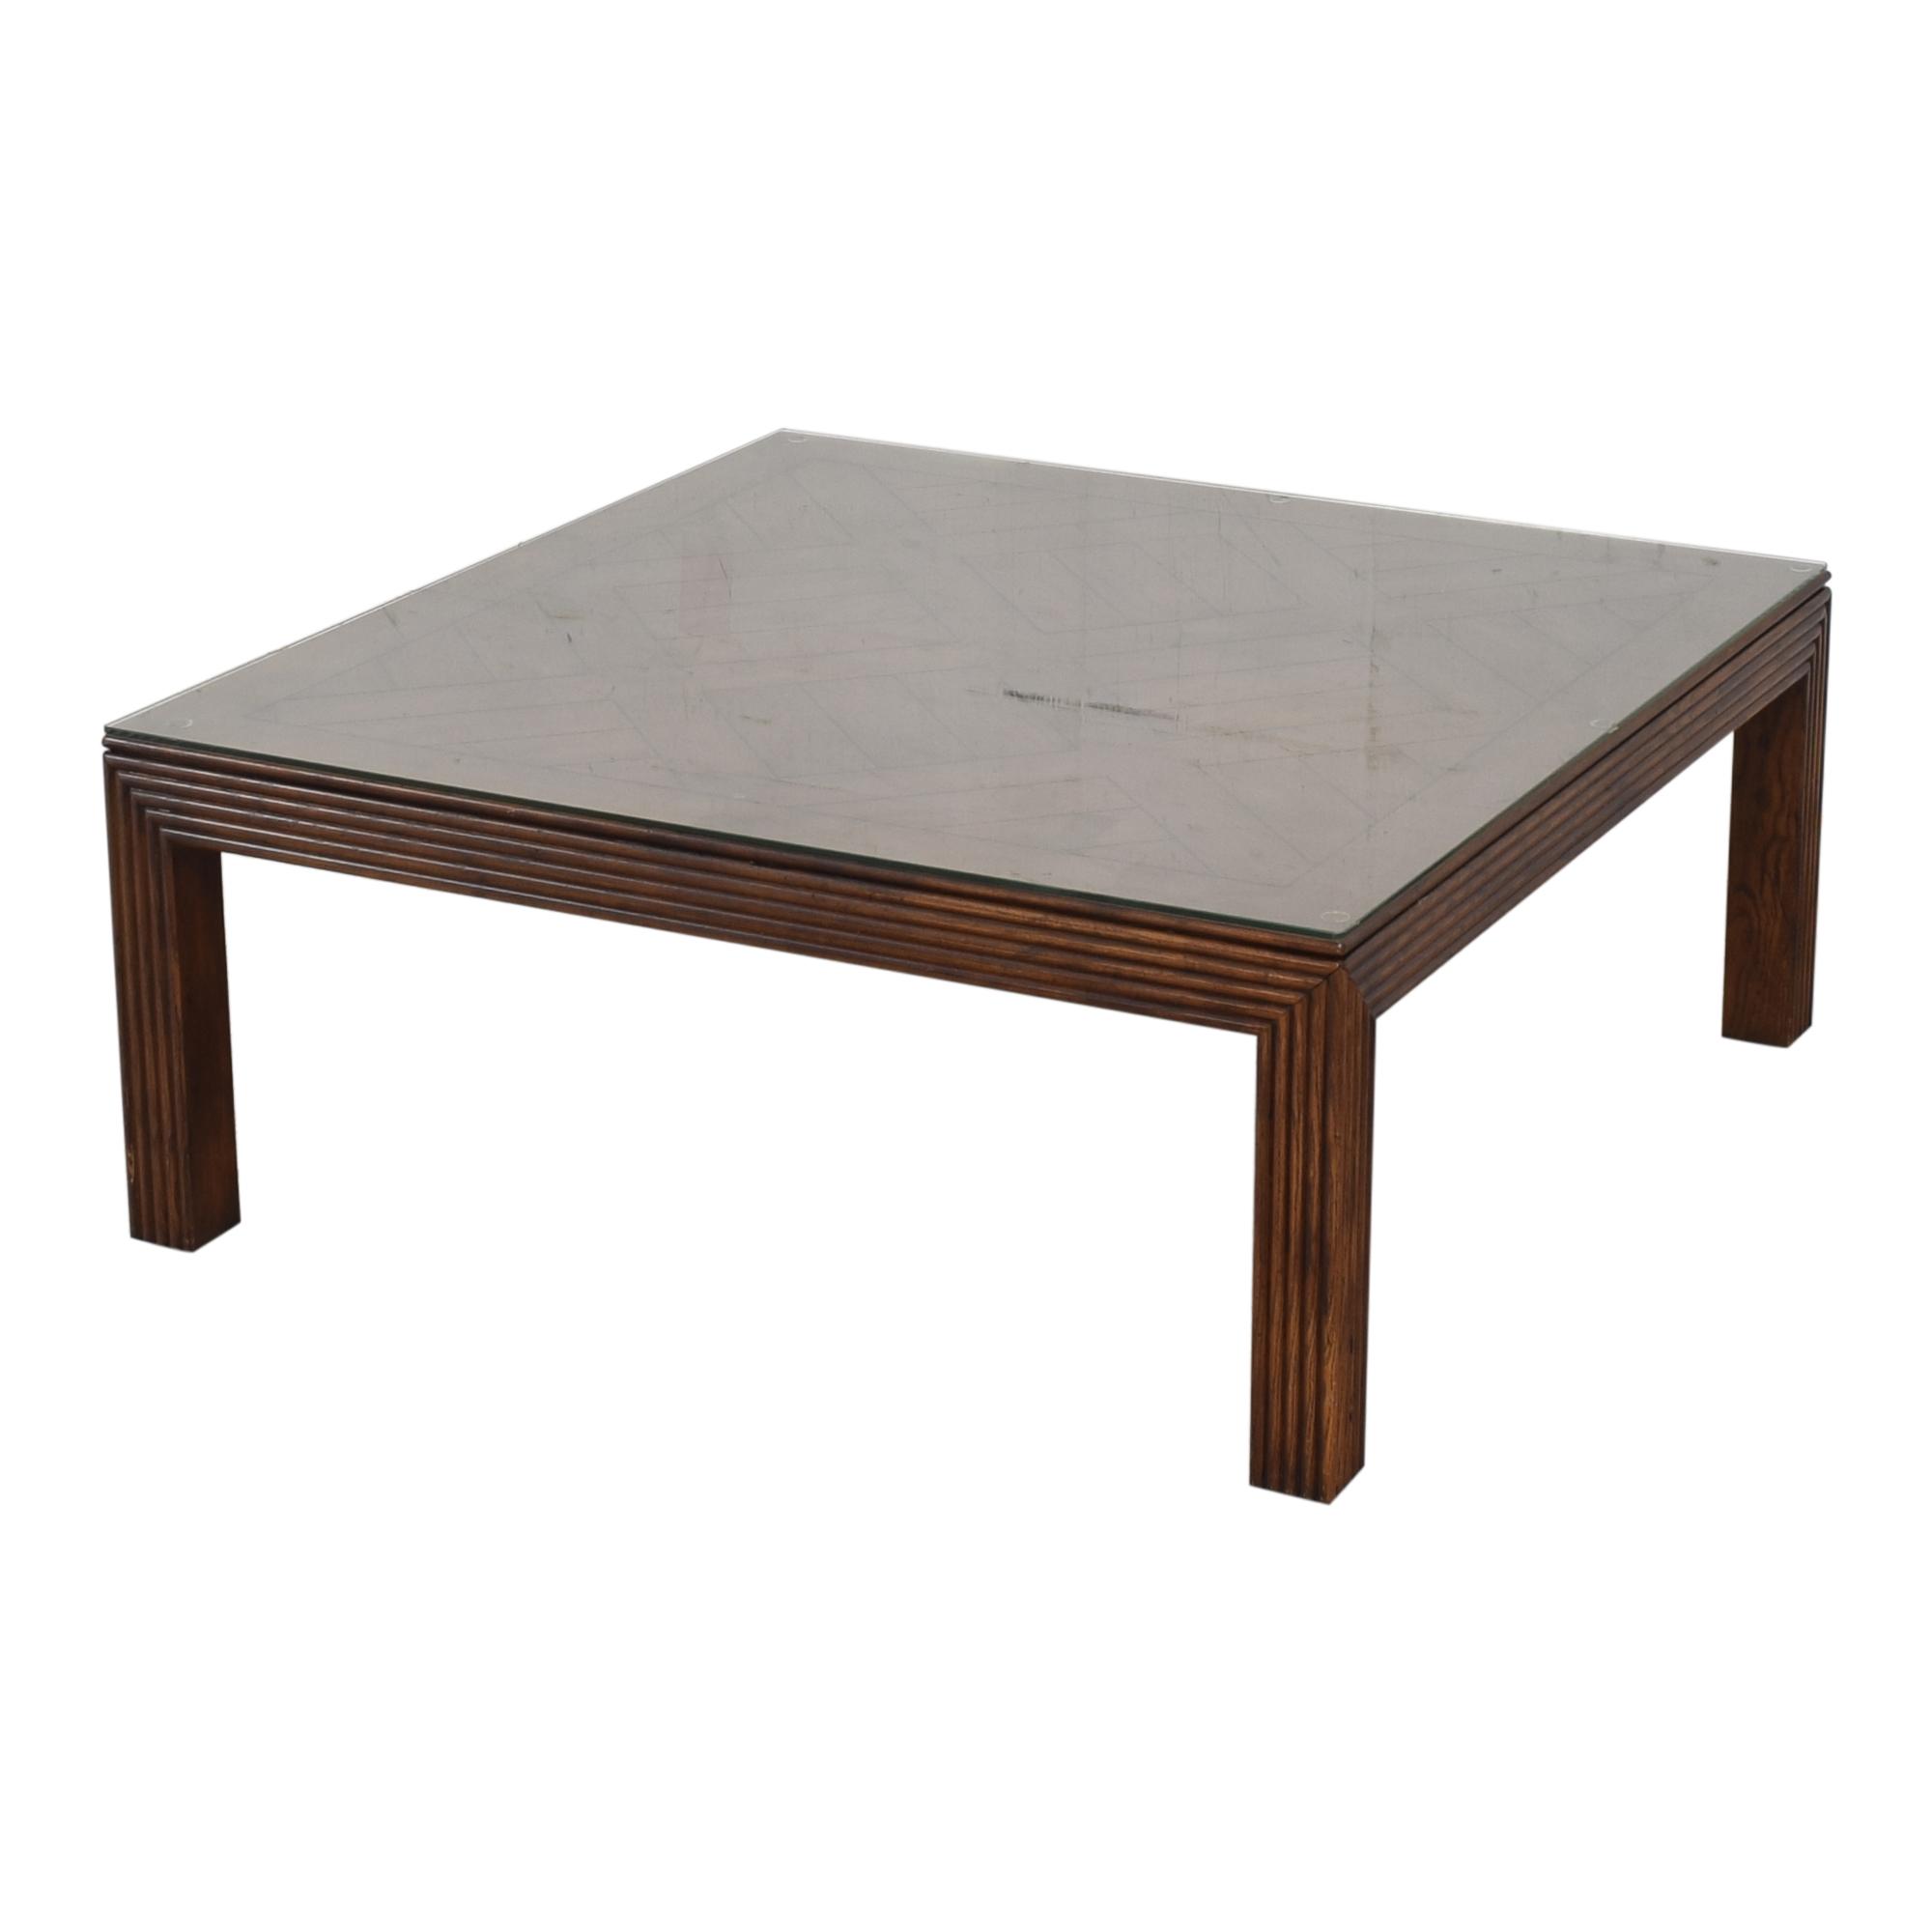 Henredon Furniture Henredon Furniture Square Coffee Table price